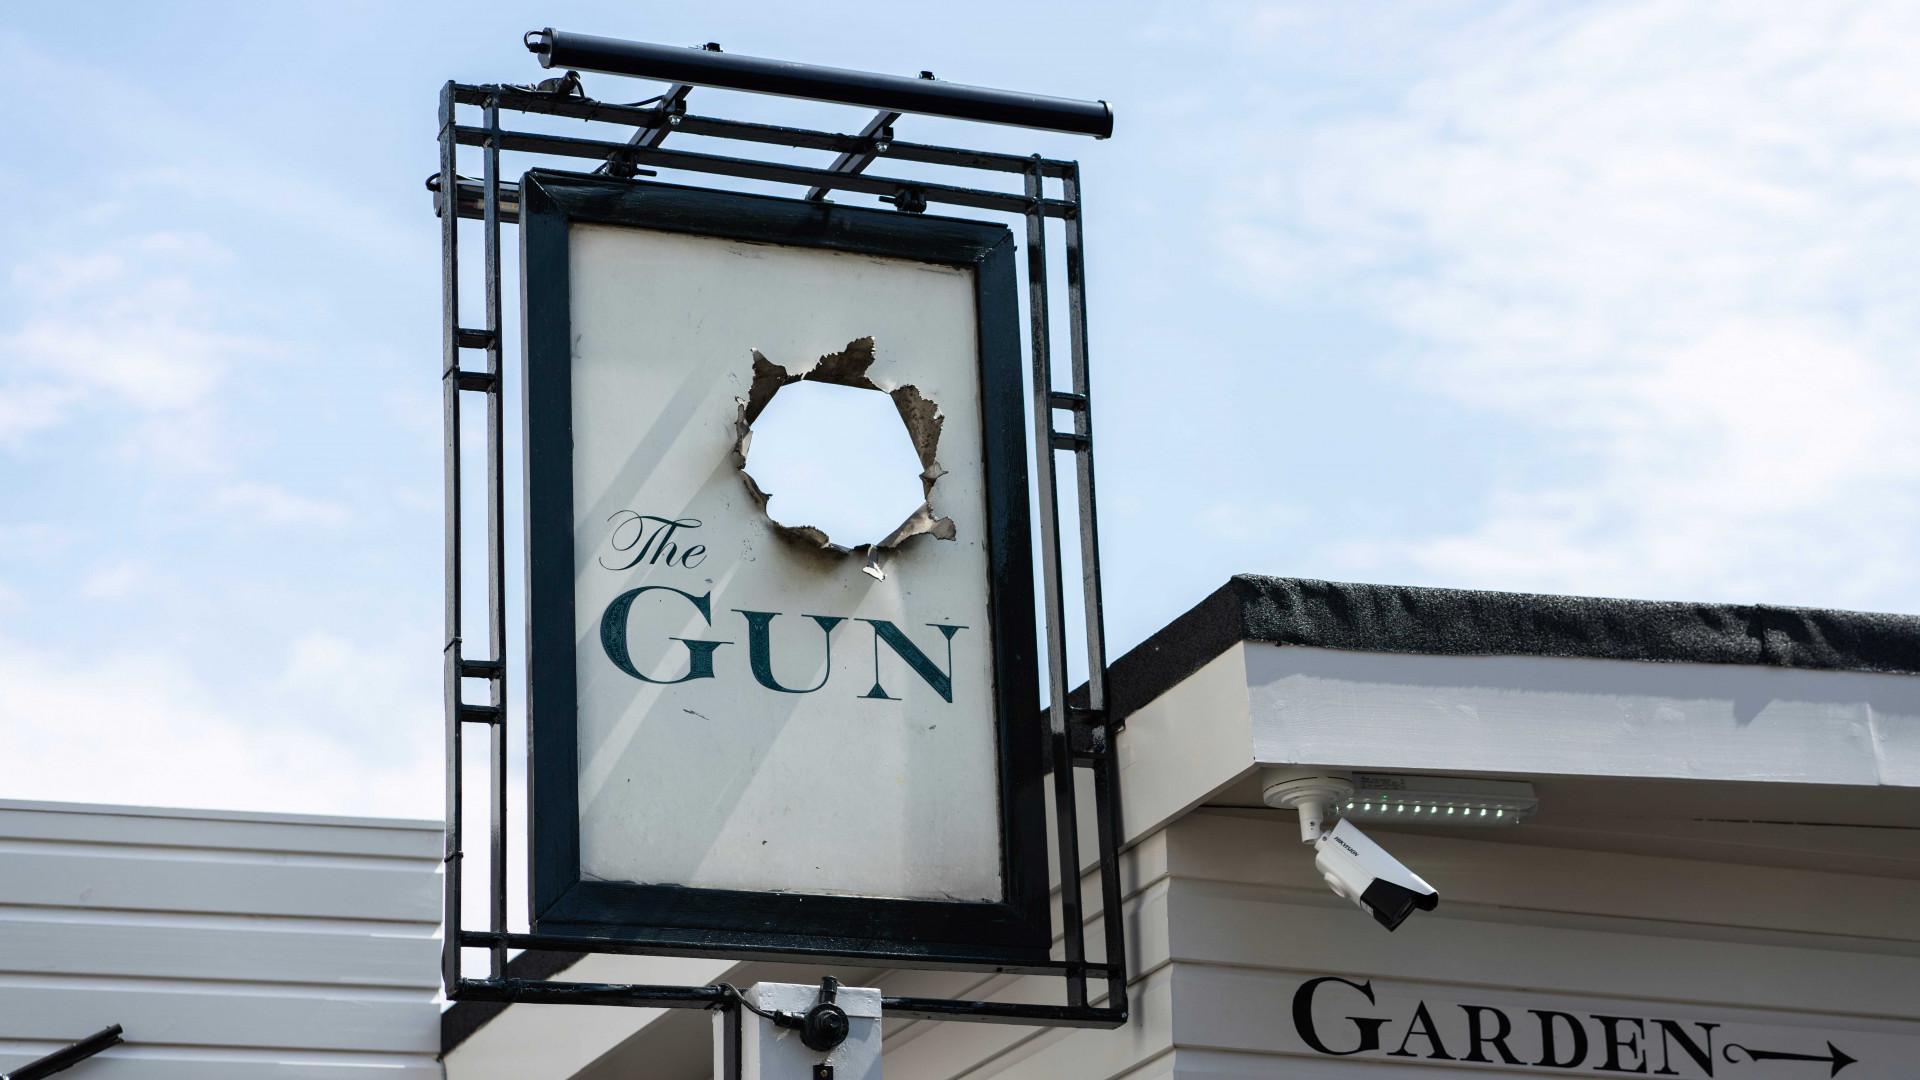 The Gun, Docklands